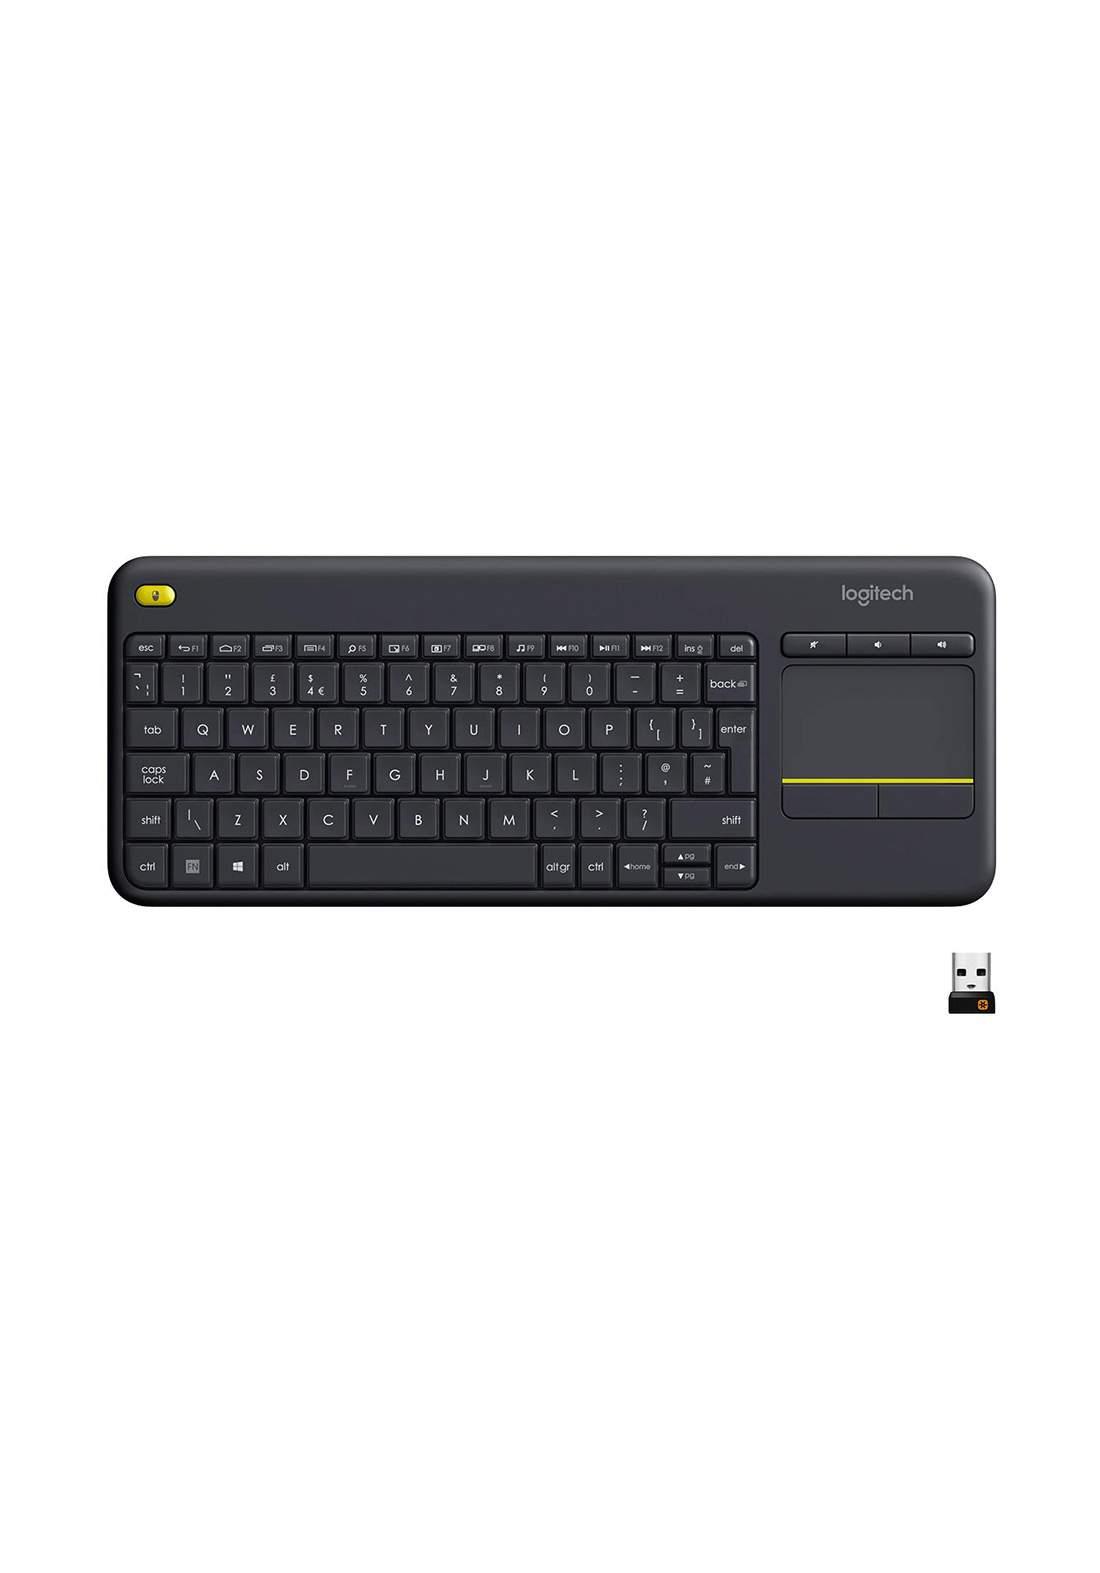 Logitech K400 Plus Keyboard Wireless With Touchpad - Black لوحة مفاتيح